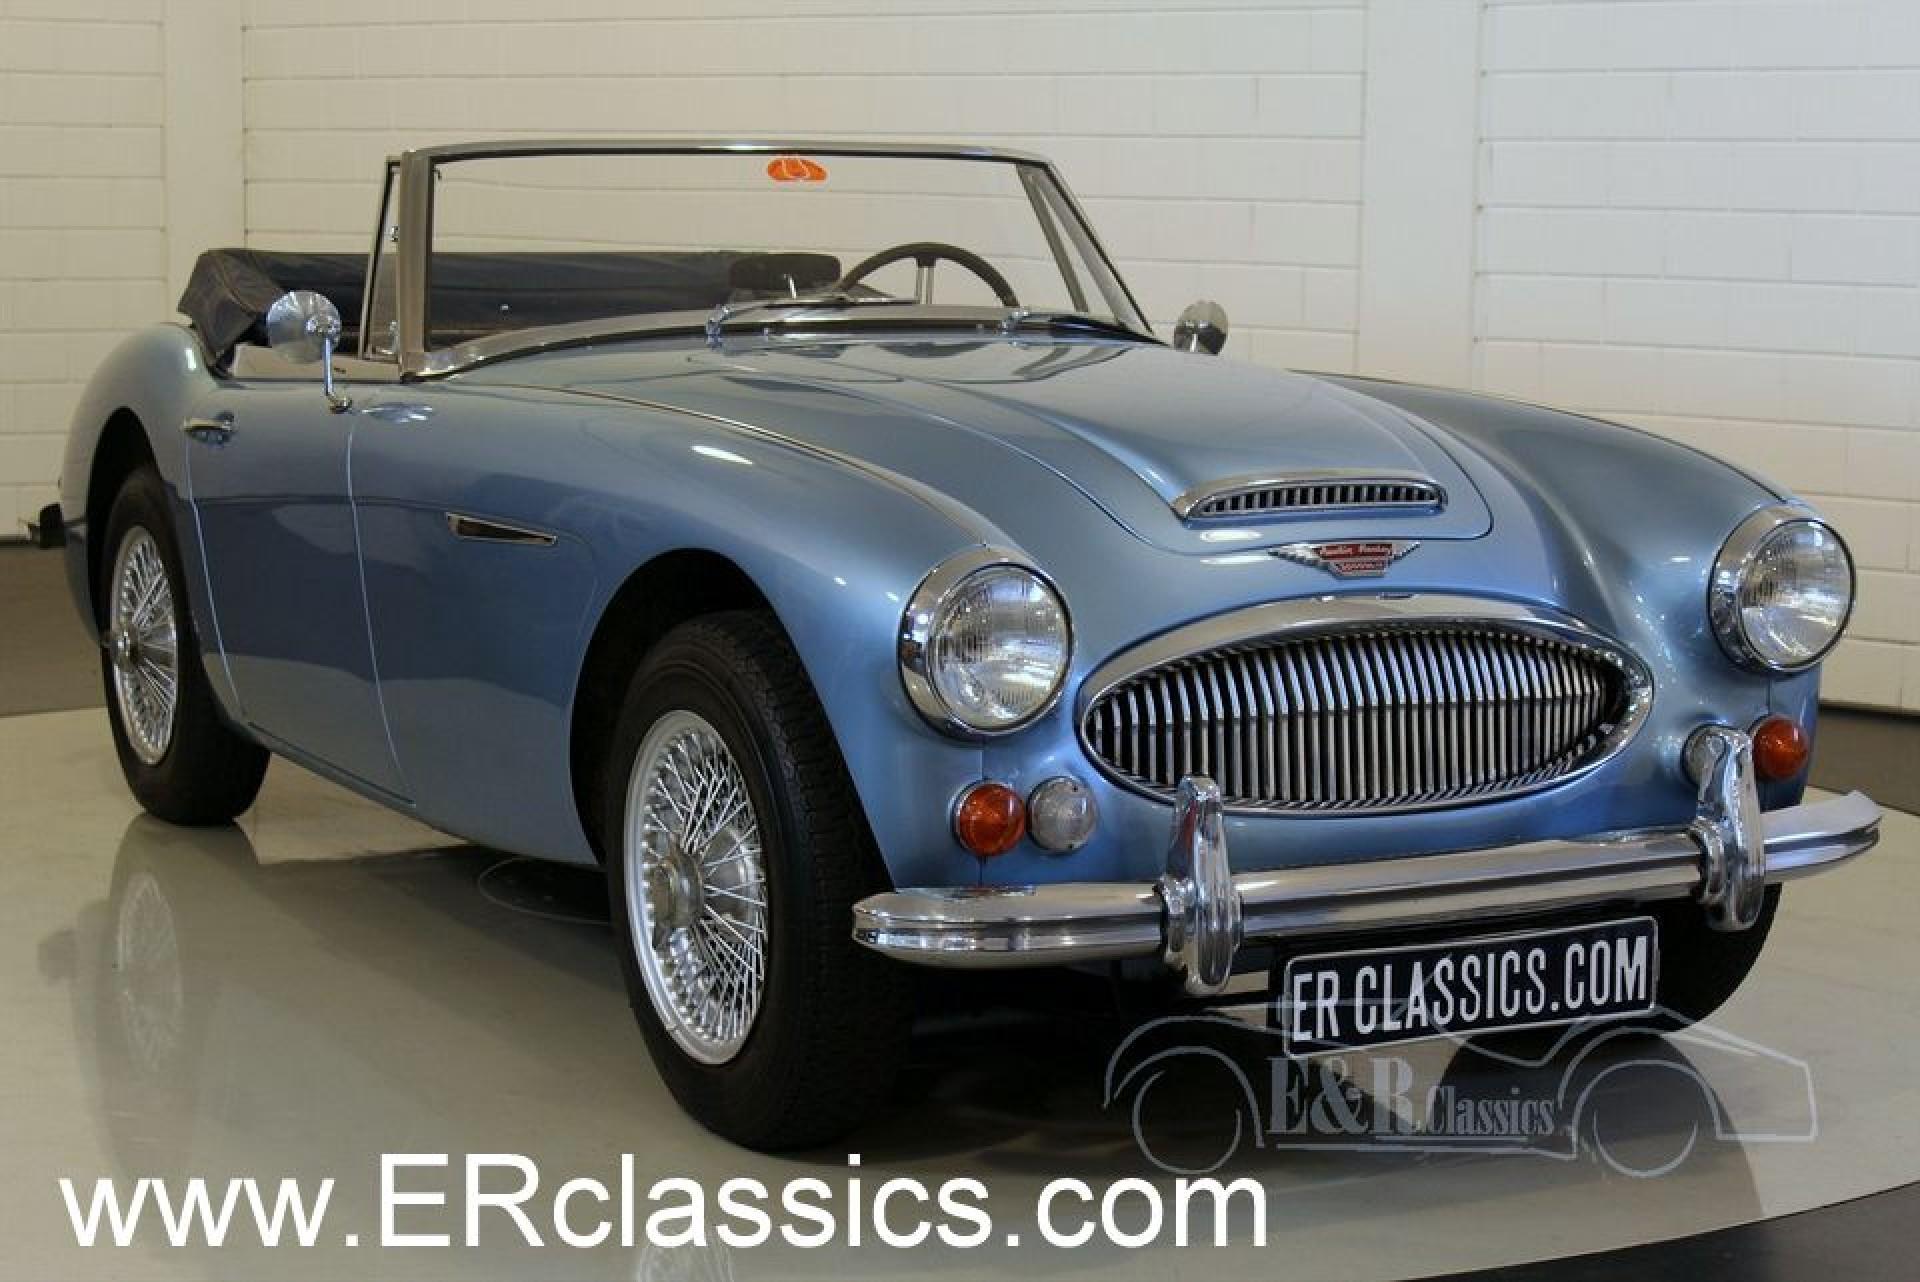 Austin-Healey Classic cars for sale | Autoclassics.com